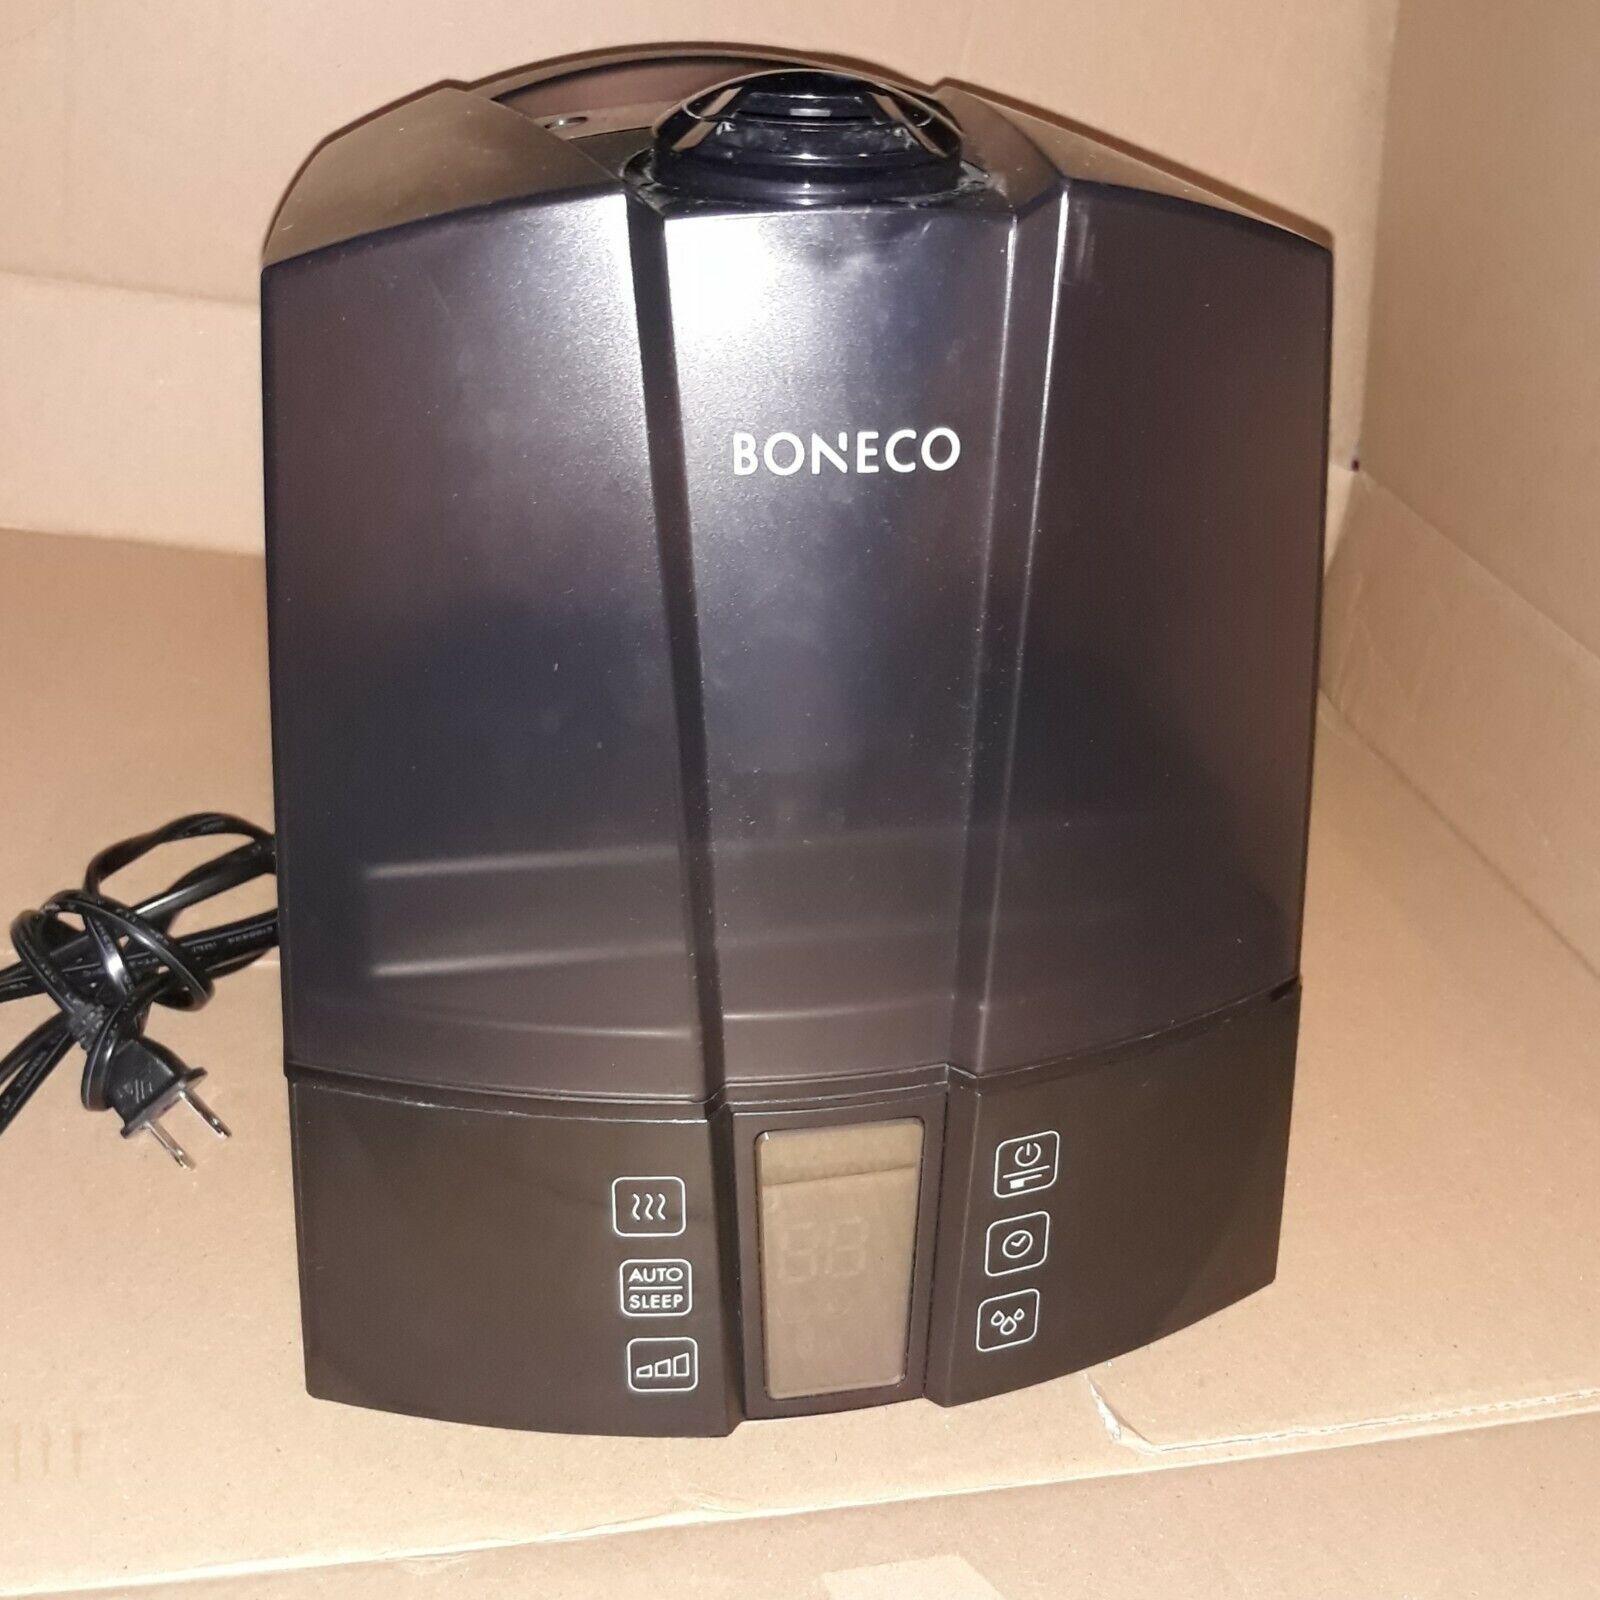 Boneco by Air O Swiss 7147 Ultrasonic Humidifier